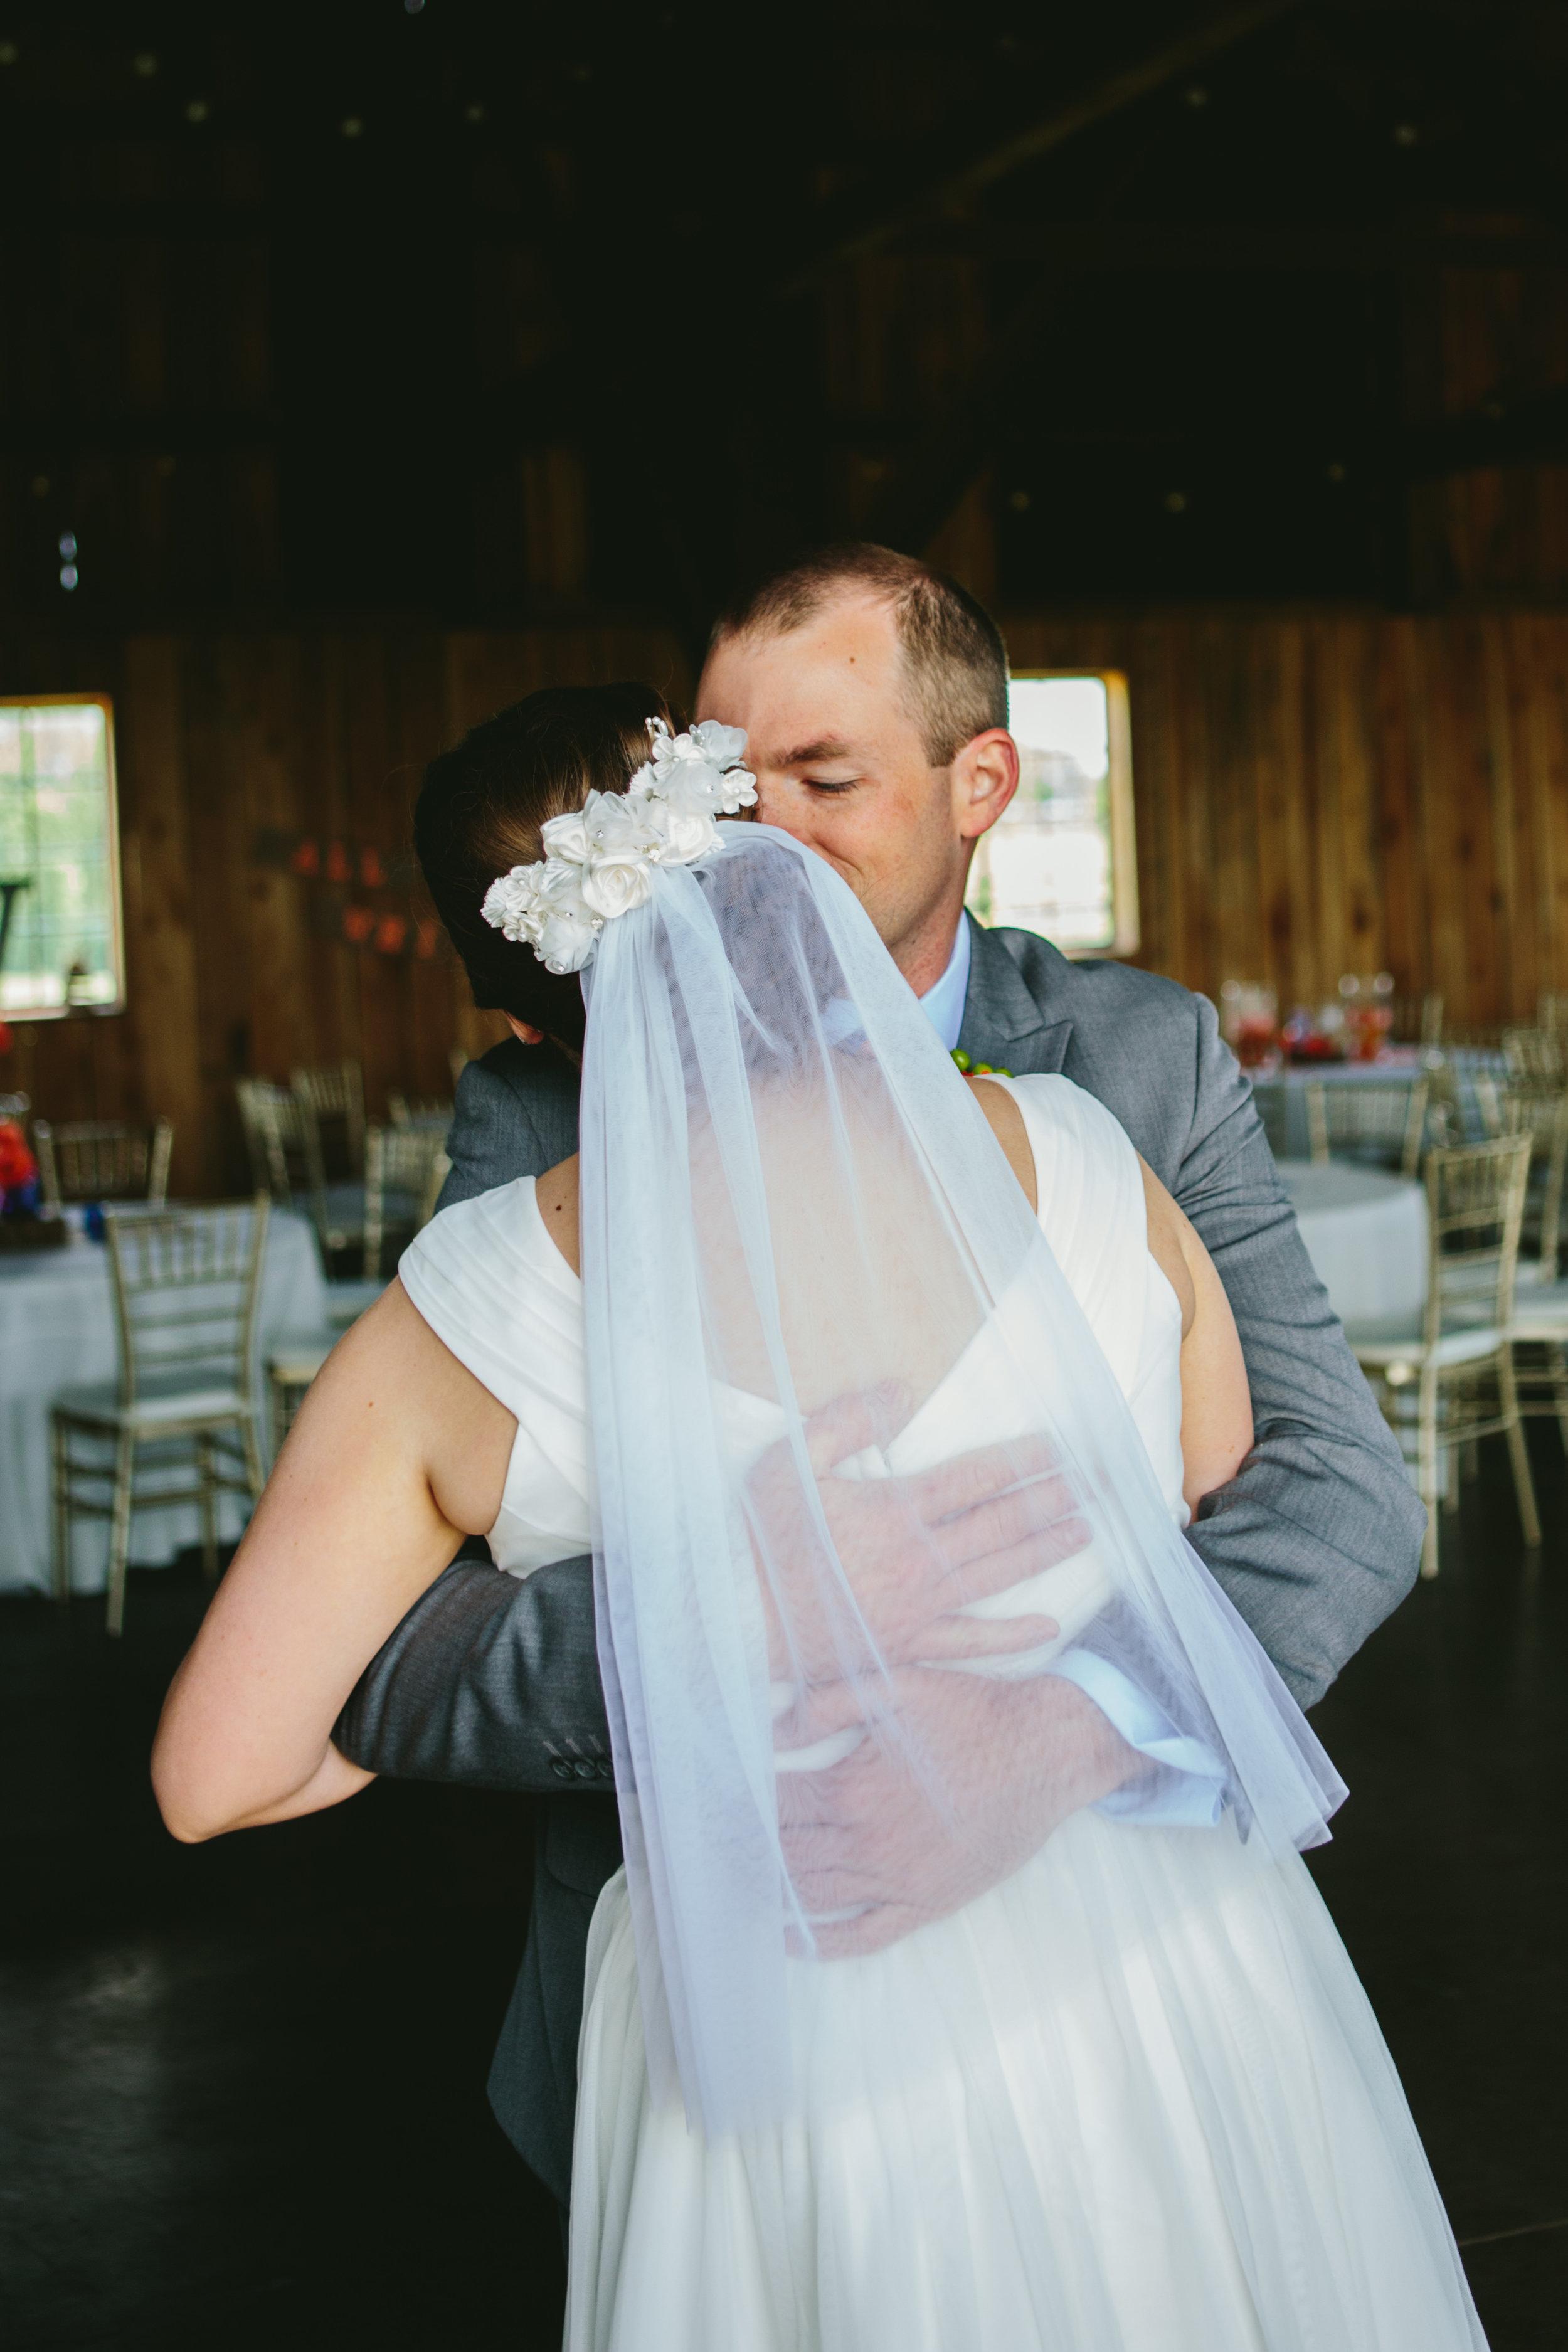 Whitesell-Mattioda Wedding-169.jpg